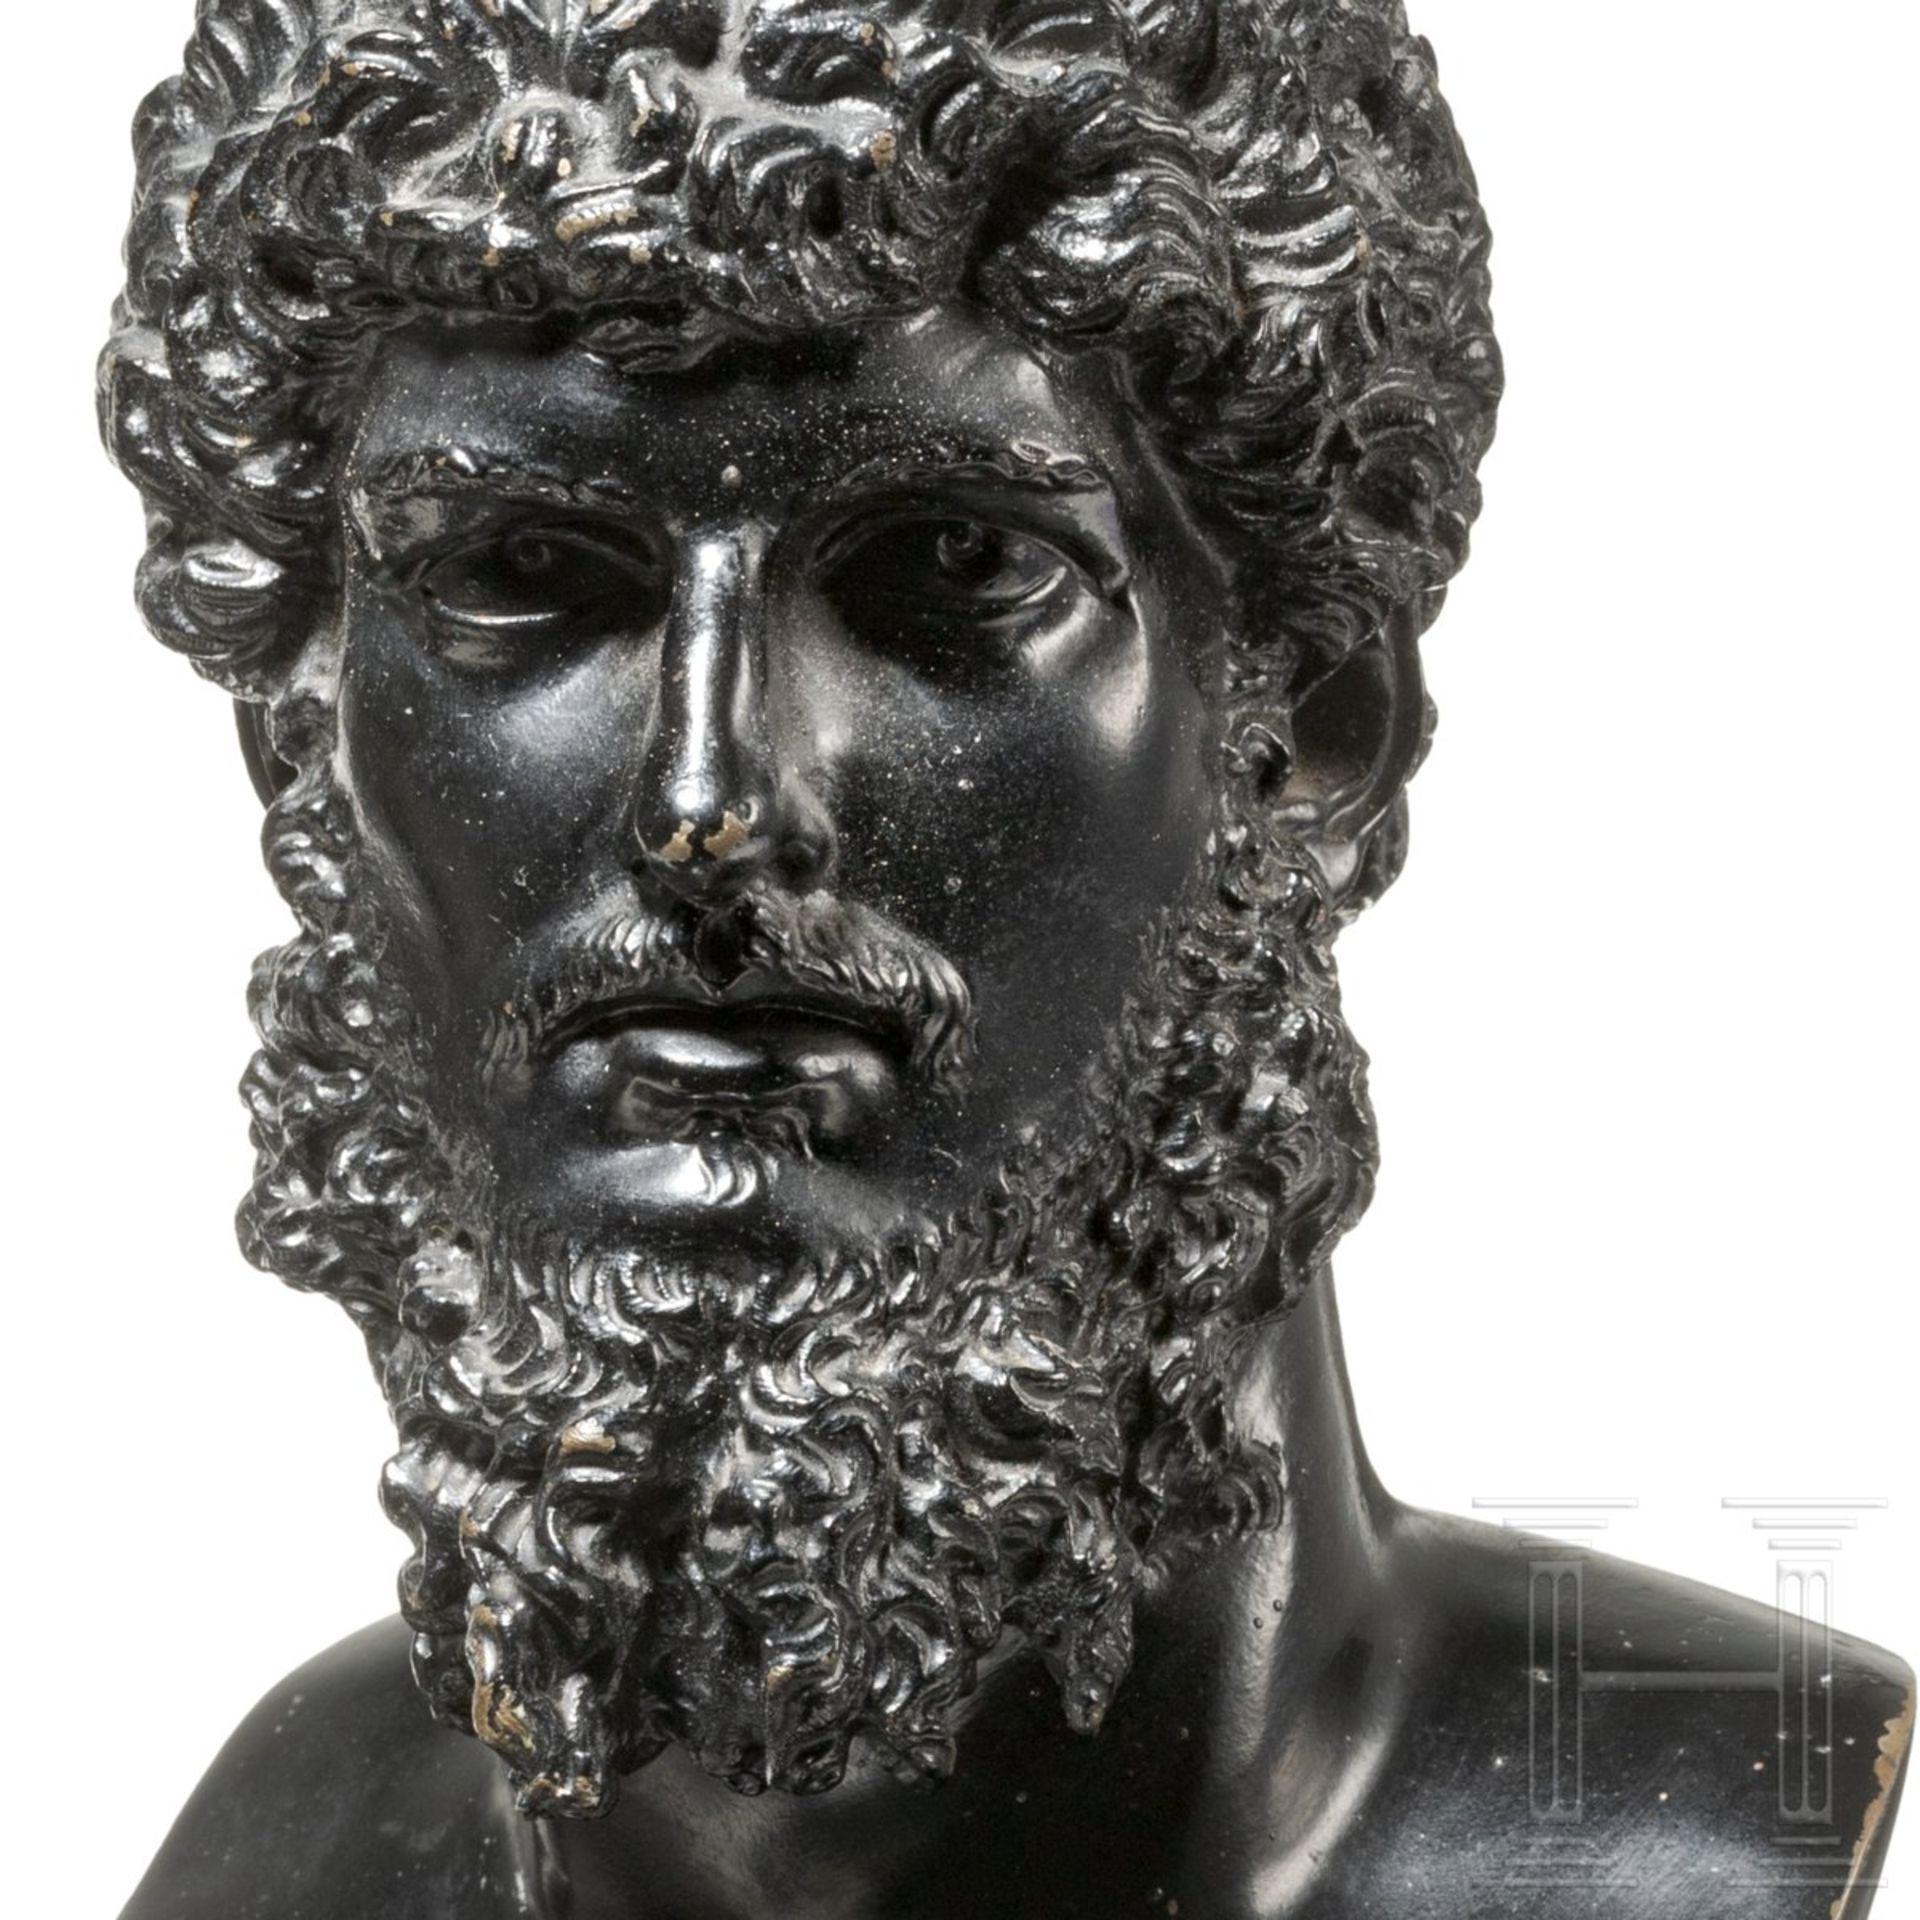 Bronzebüste des Kaisers Lucius Verus - Image 4 of 4